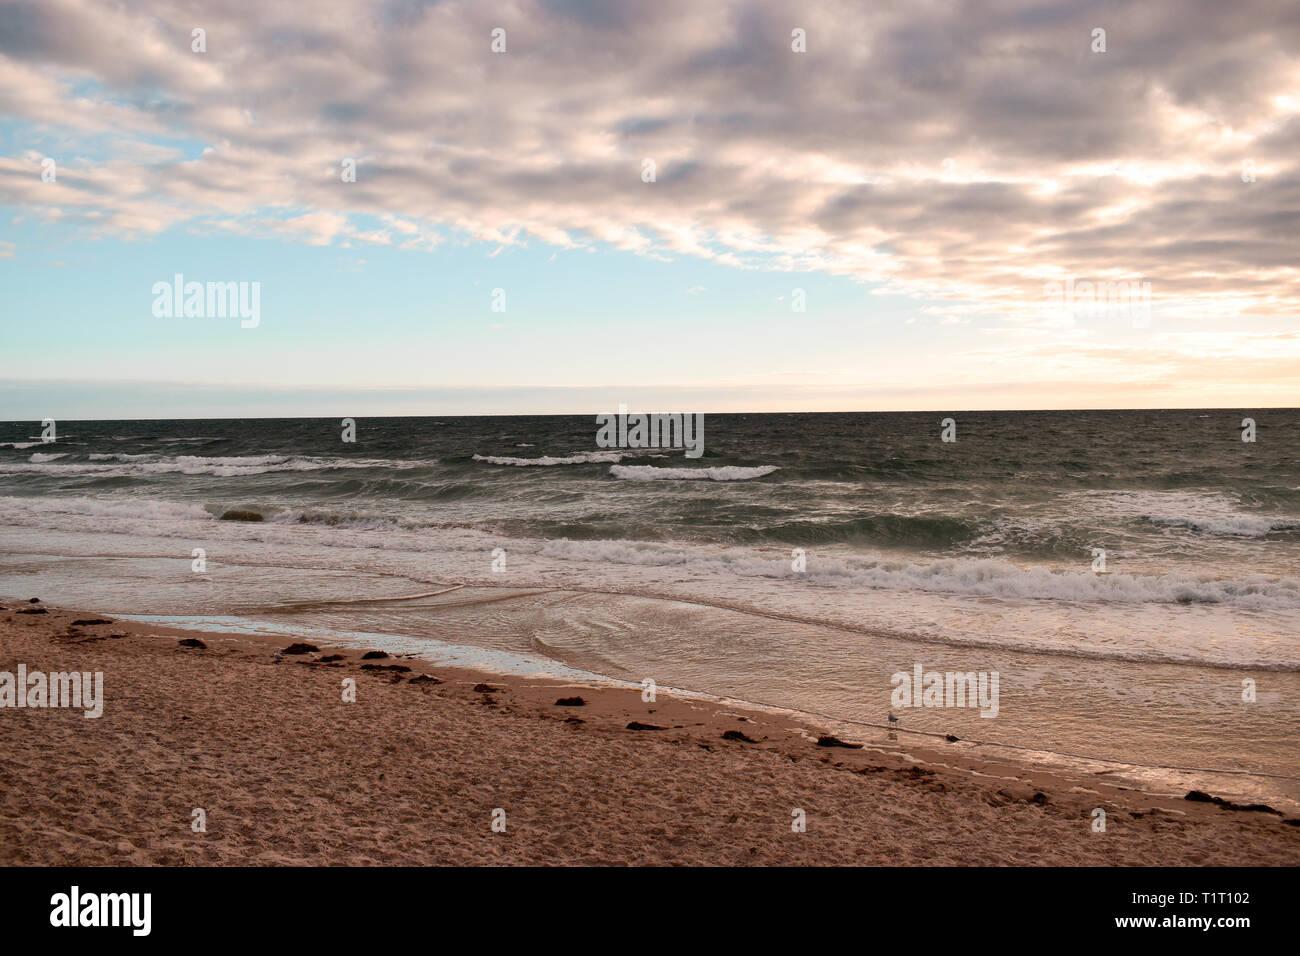 Henley Beach, South Australia - Stock Image